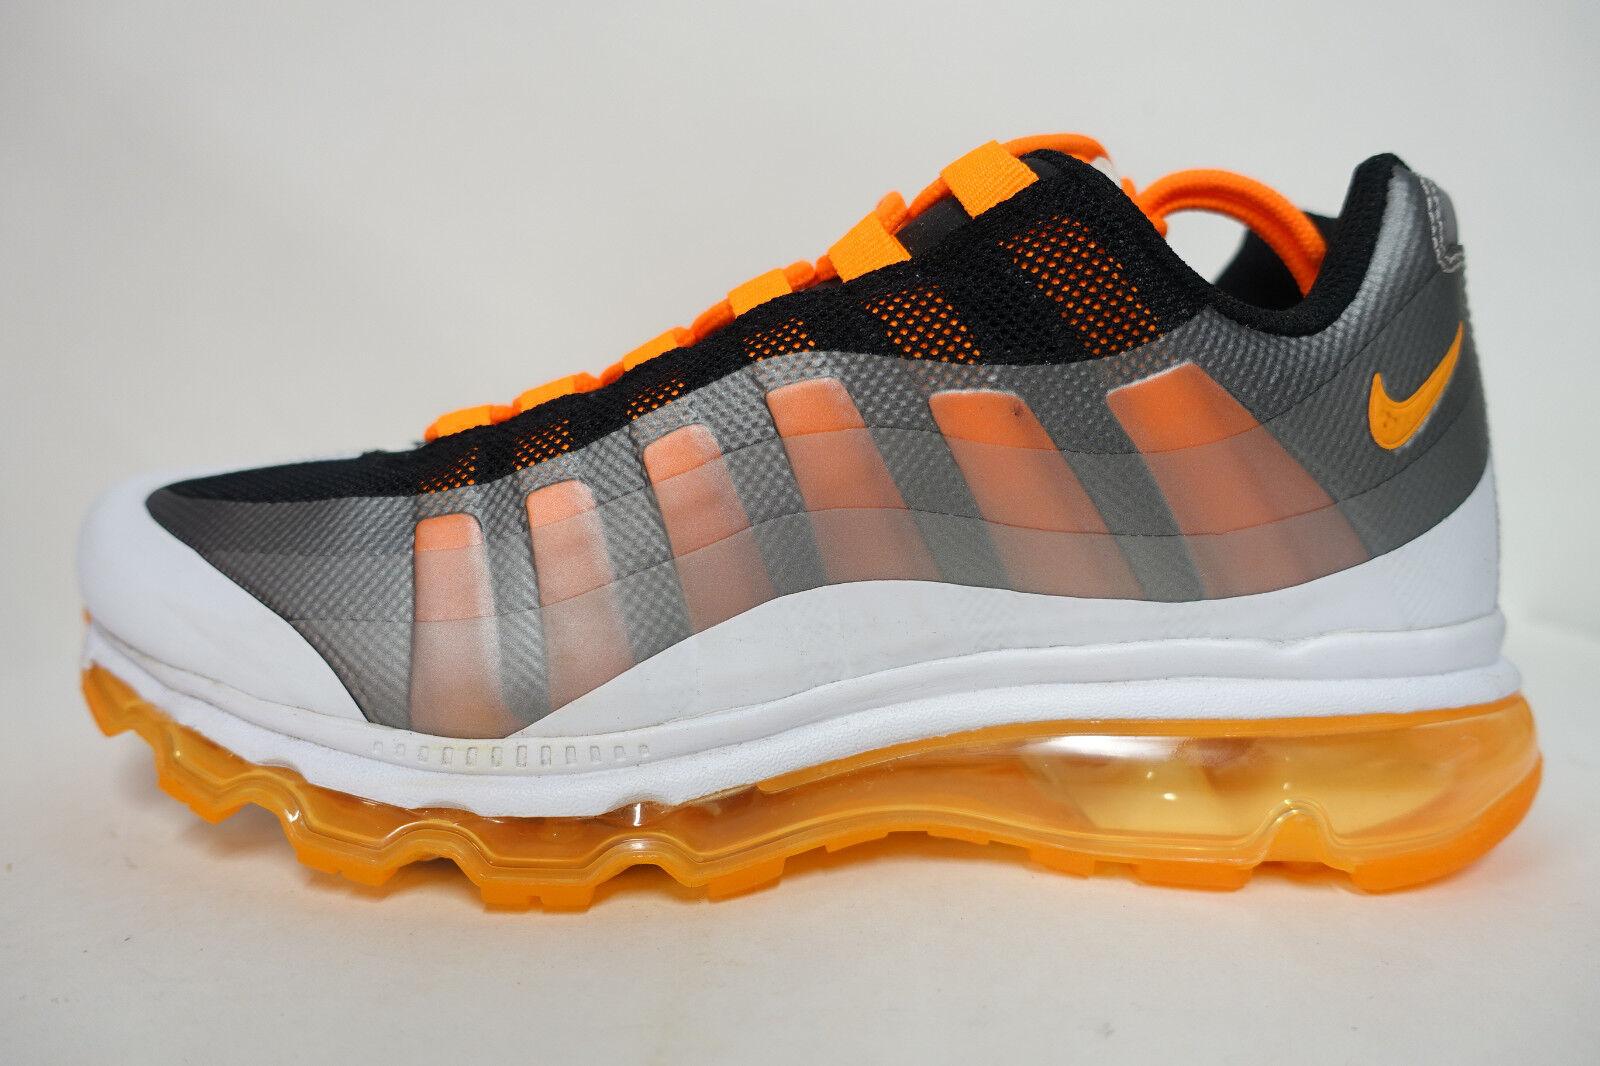 HOMME Nike Air Max 95 + Bb Chaussures Pointure 8 Blanc Noir Orange Argent 511307